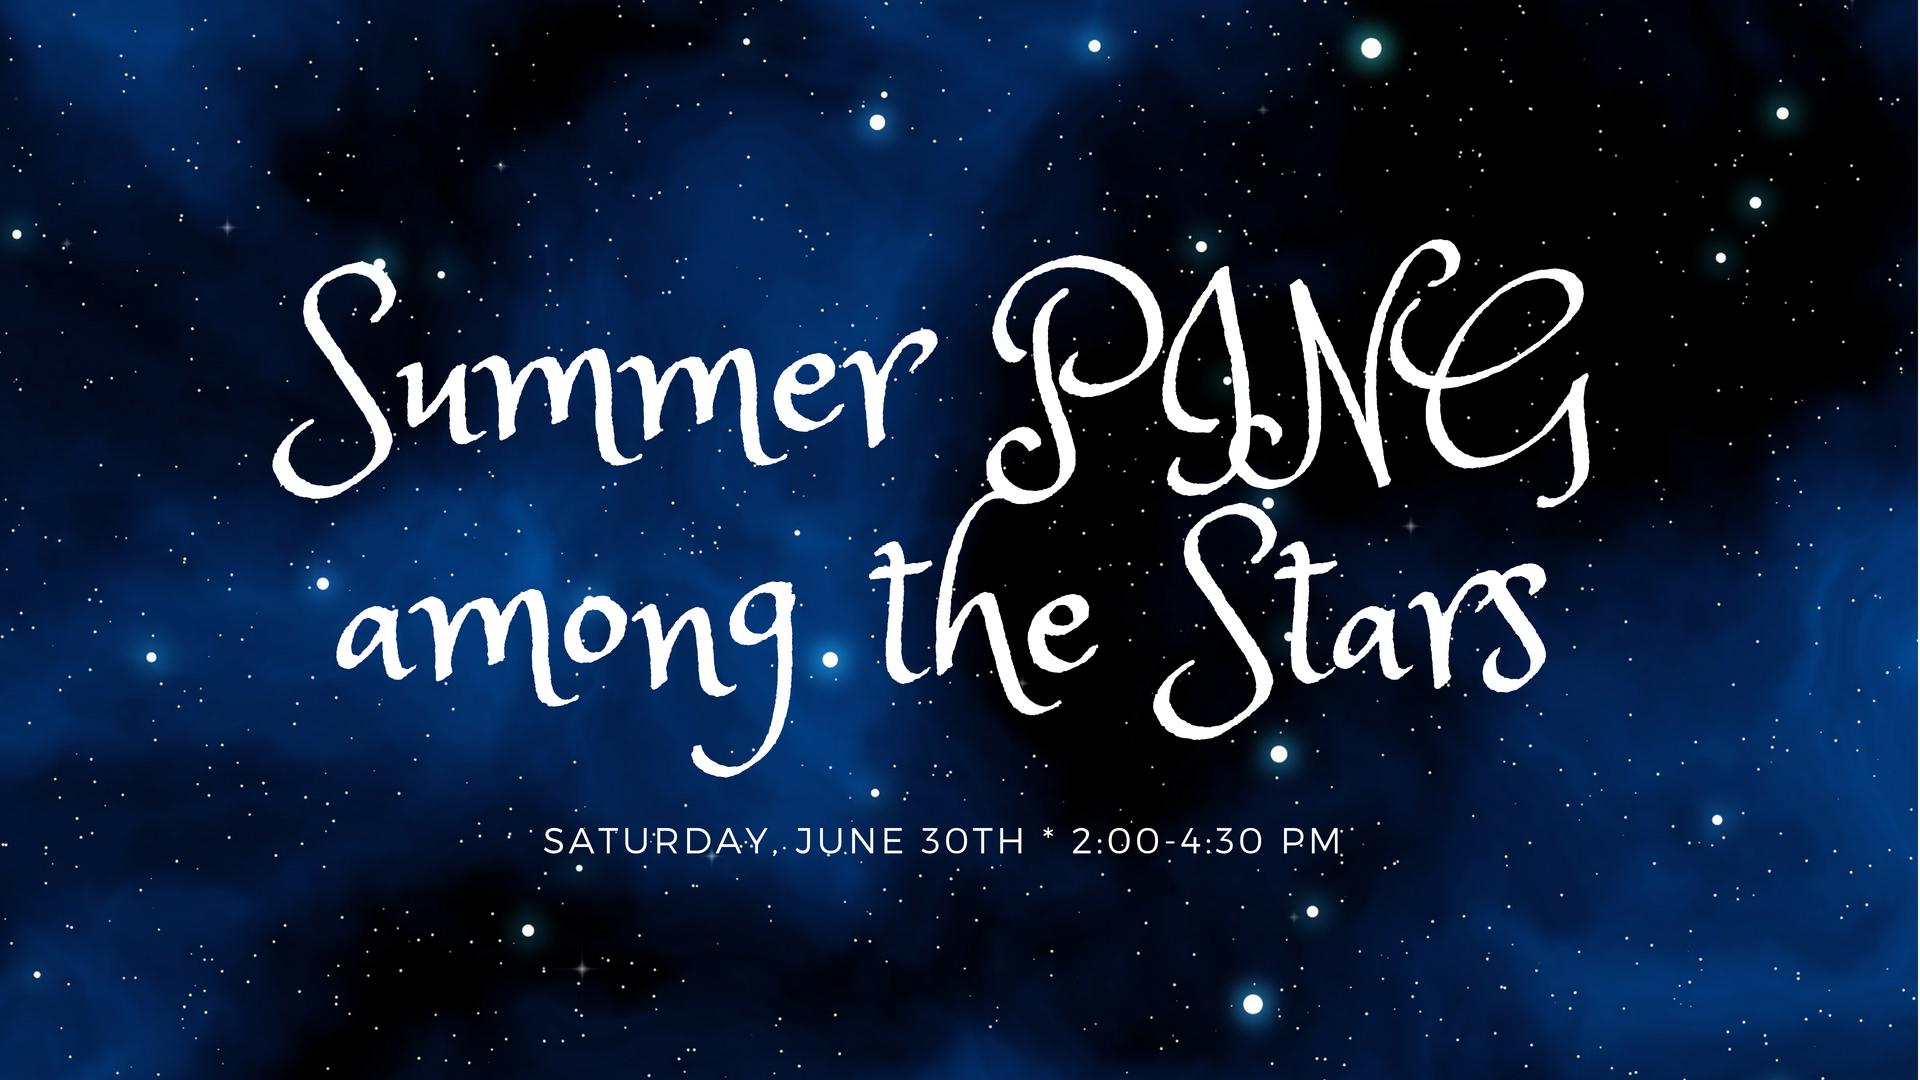 Summer PING Among the Stars